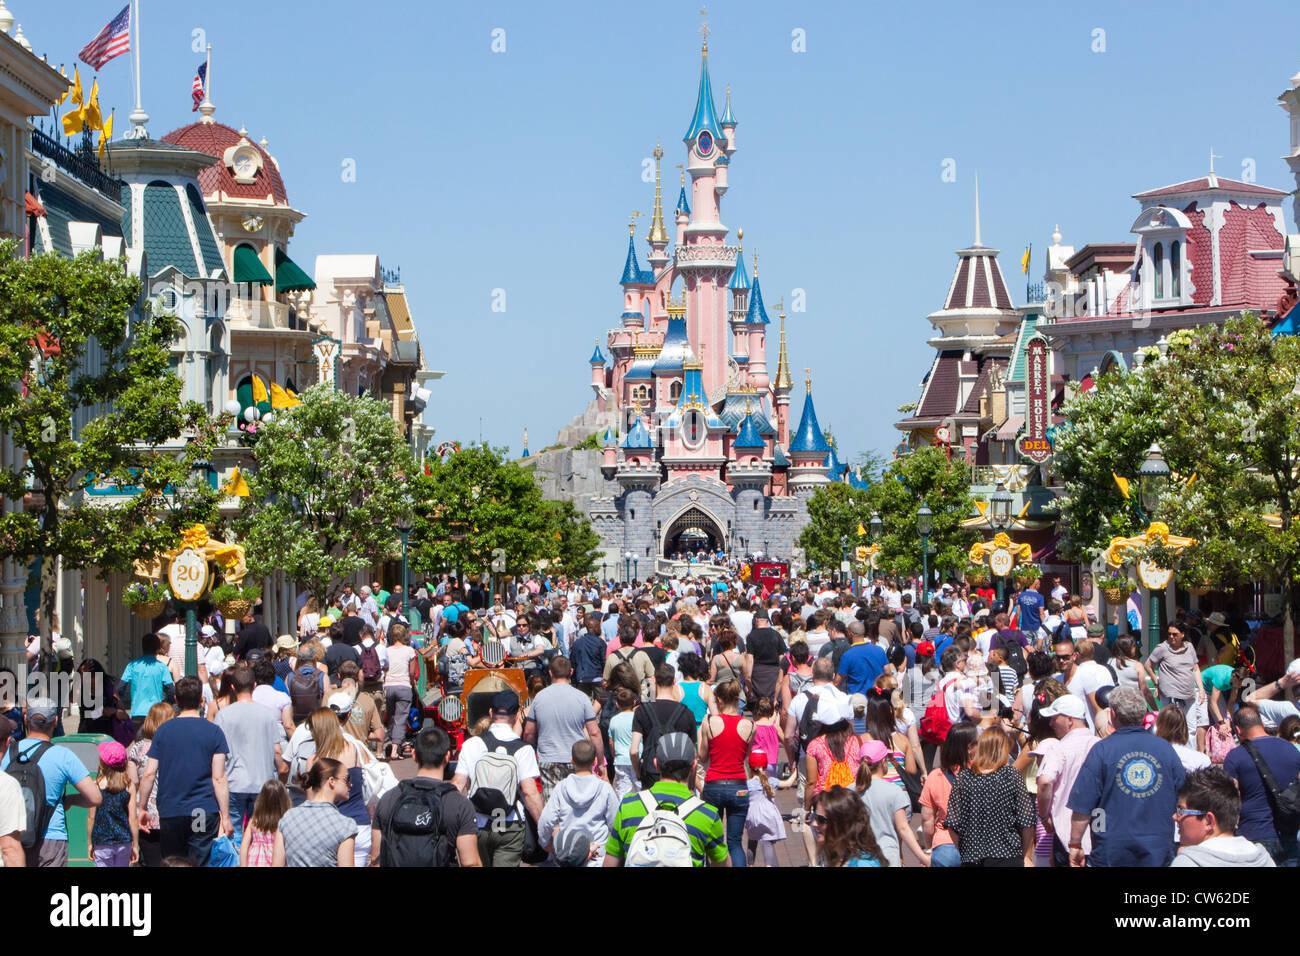 Euro Disneyland resort - Sleeping beauty castle Stock Photo